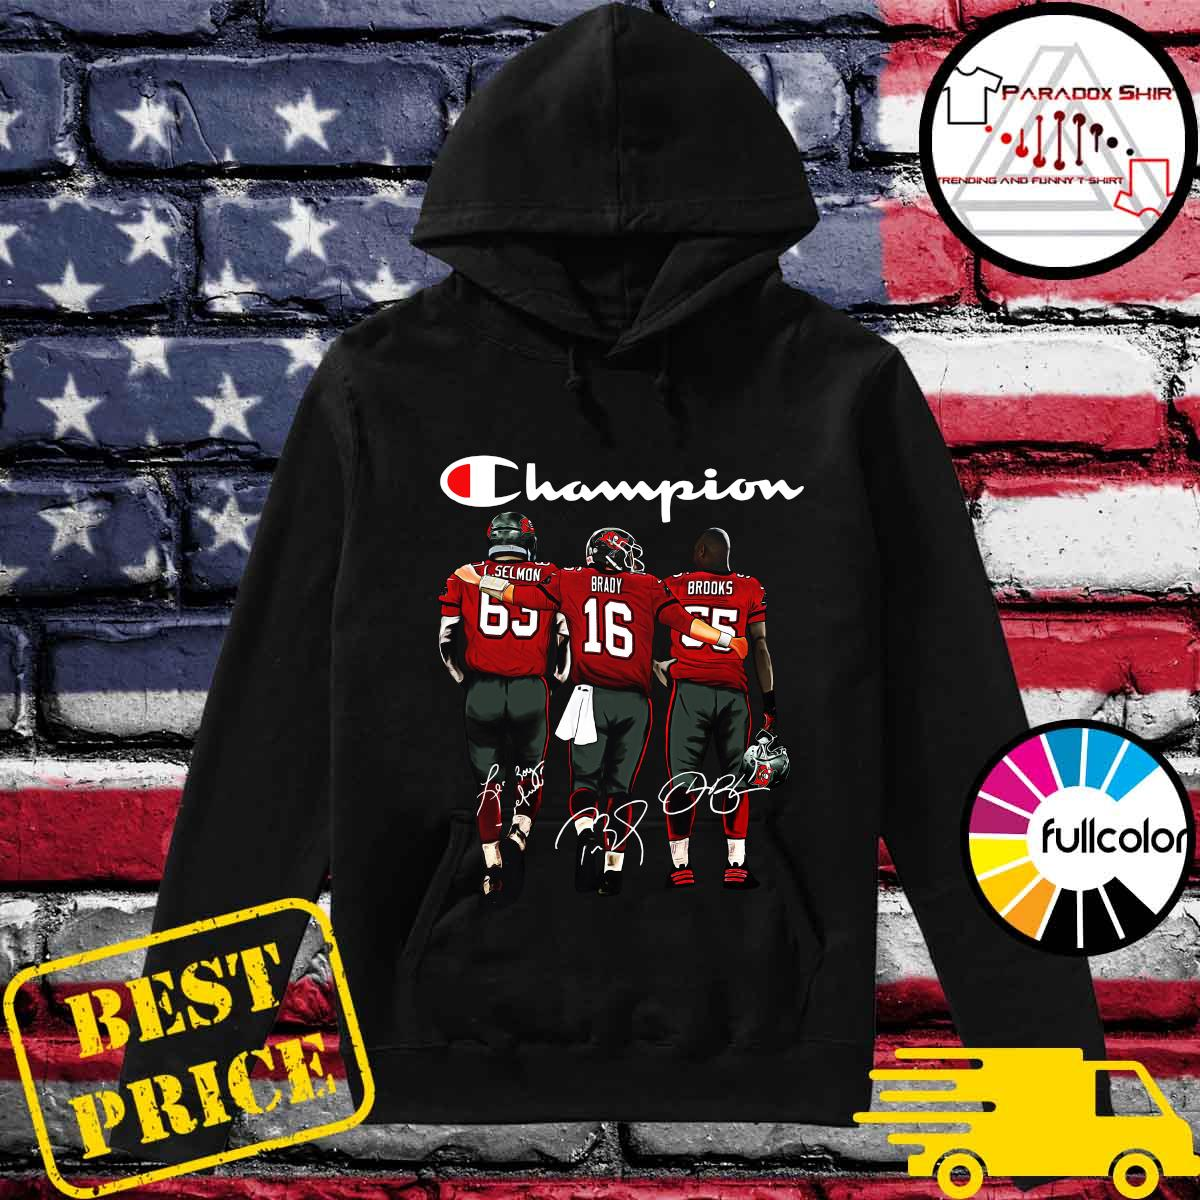 Champion Tampa Bay Buccaneers Lee Roy Selmon 63 Tom Brady 16 Derrick Brooks 55 Signatures Shirt Hoodie